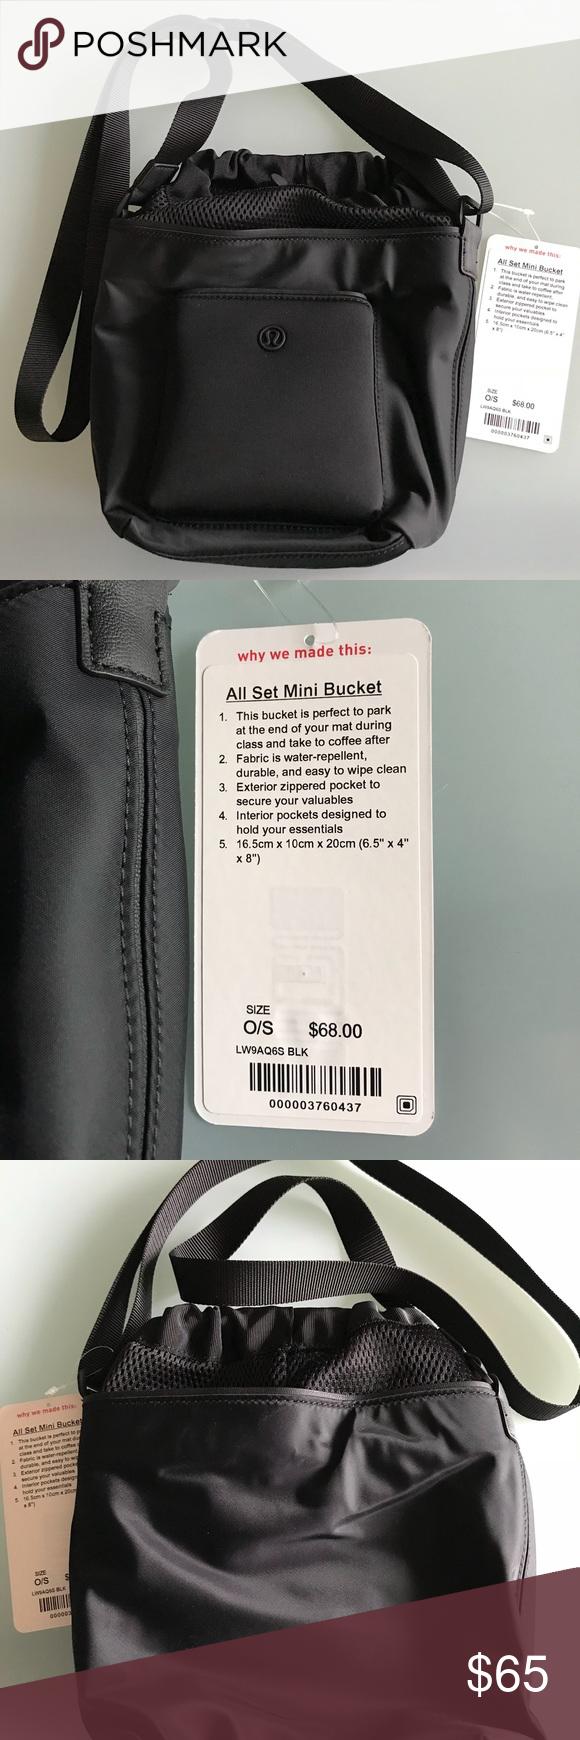 51b9b291 Lululemon All Set Mini Bucket Bag Lululemon All Set Mini Bucket bag in  black. NWT lululemon athletica Bags Mini Bags | My Posh Picks | Mini Bag,  Bags, ...